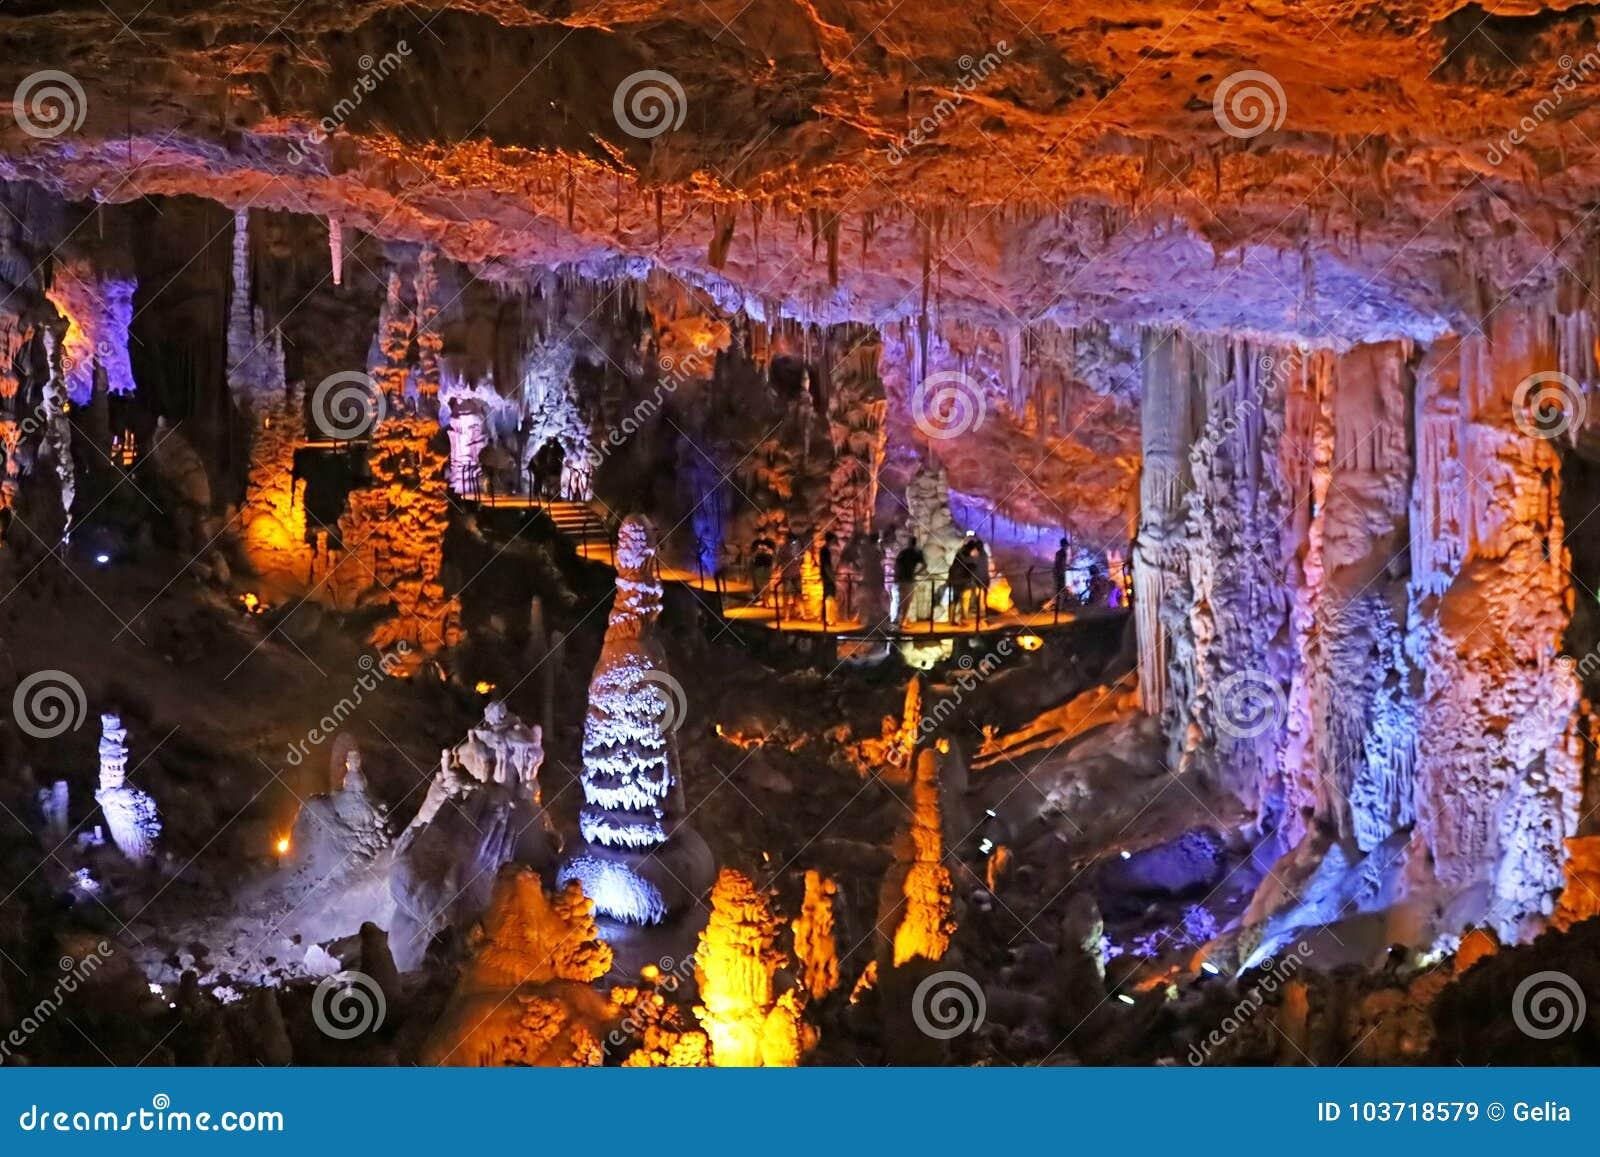 Maximillian Shemesh: Avshalom Cave, Also Known As Soreq Cave, A Large